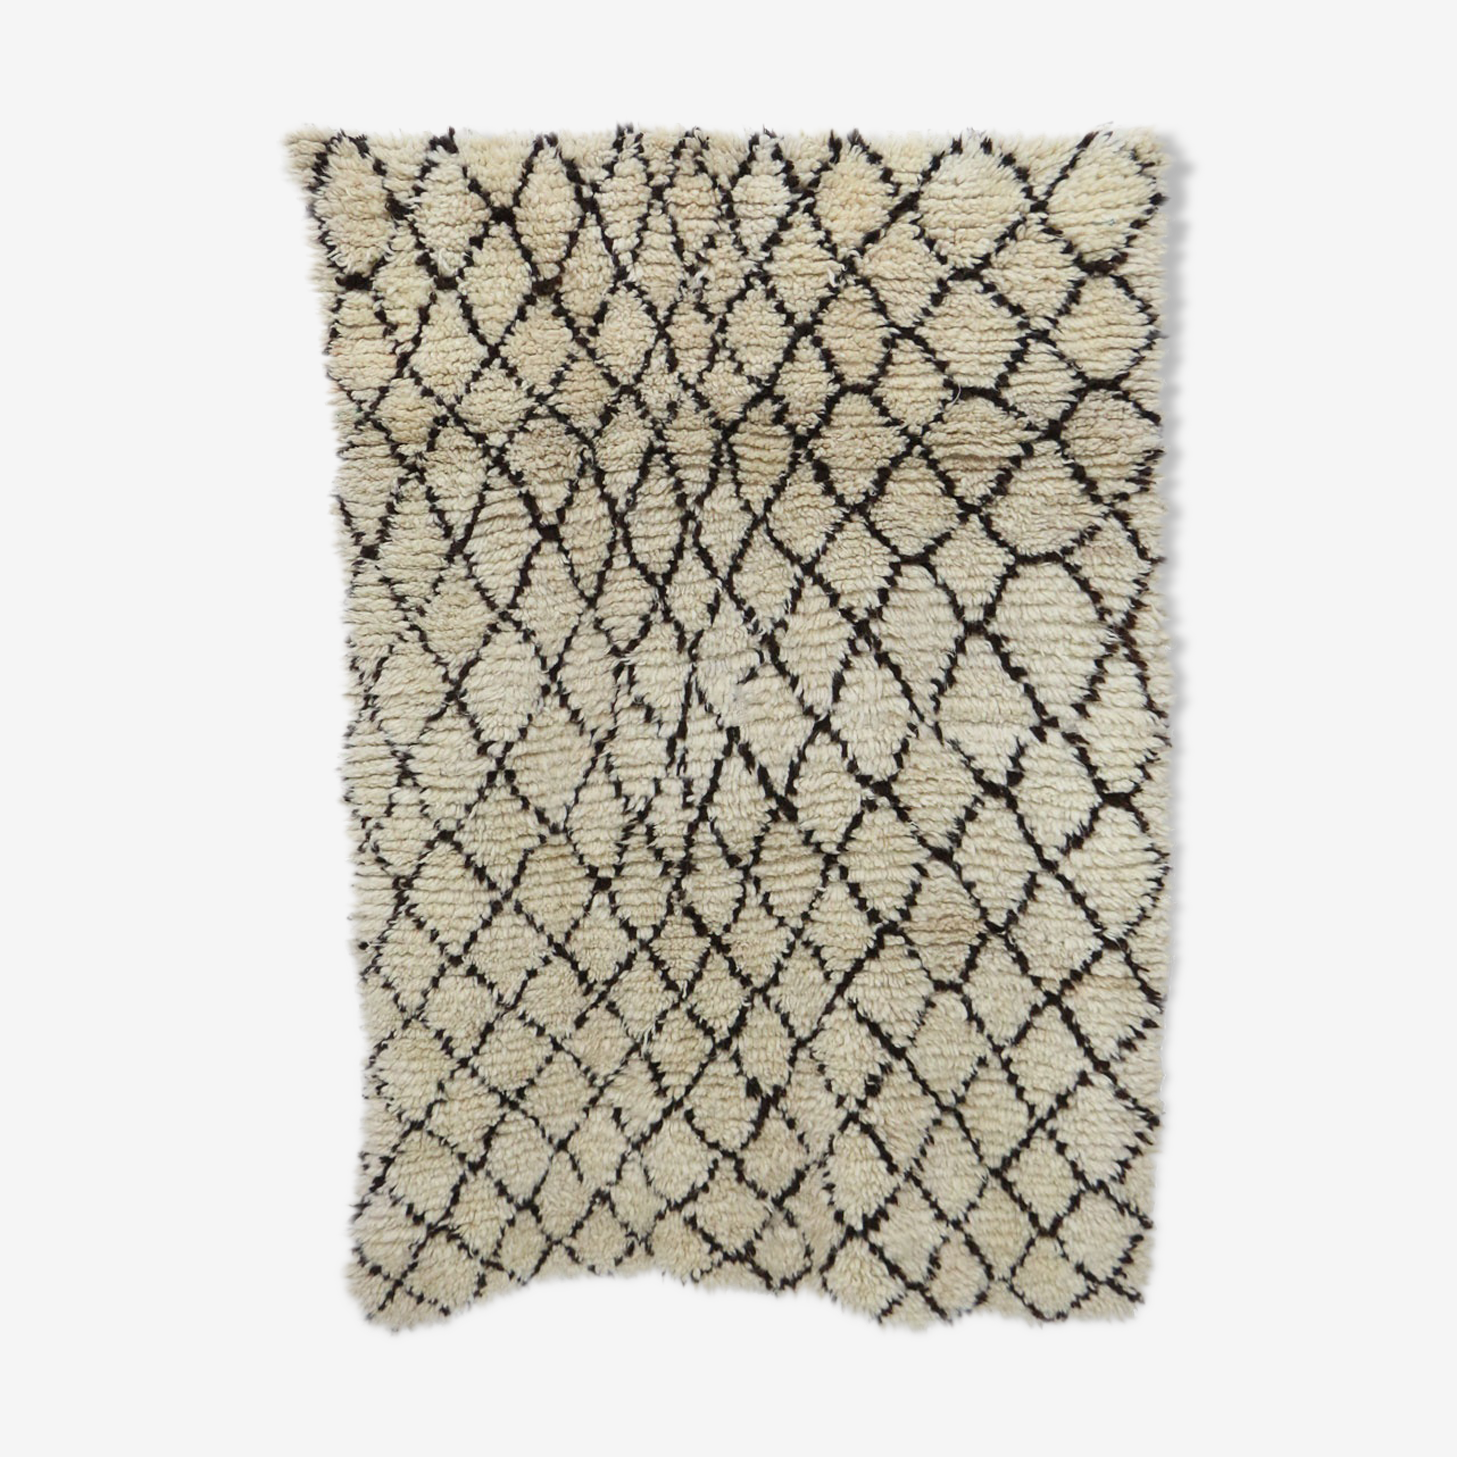 Azilal moroccan rug 130 x 172 cm